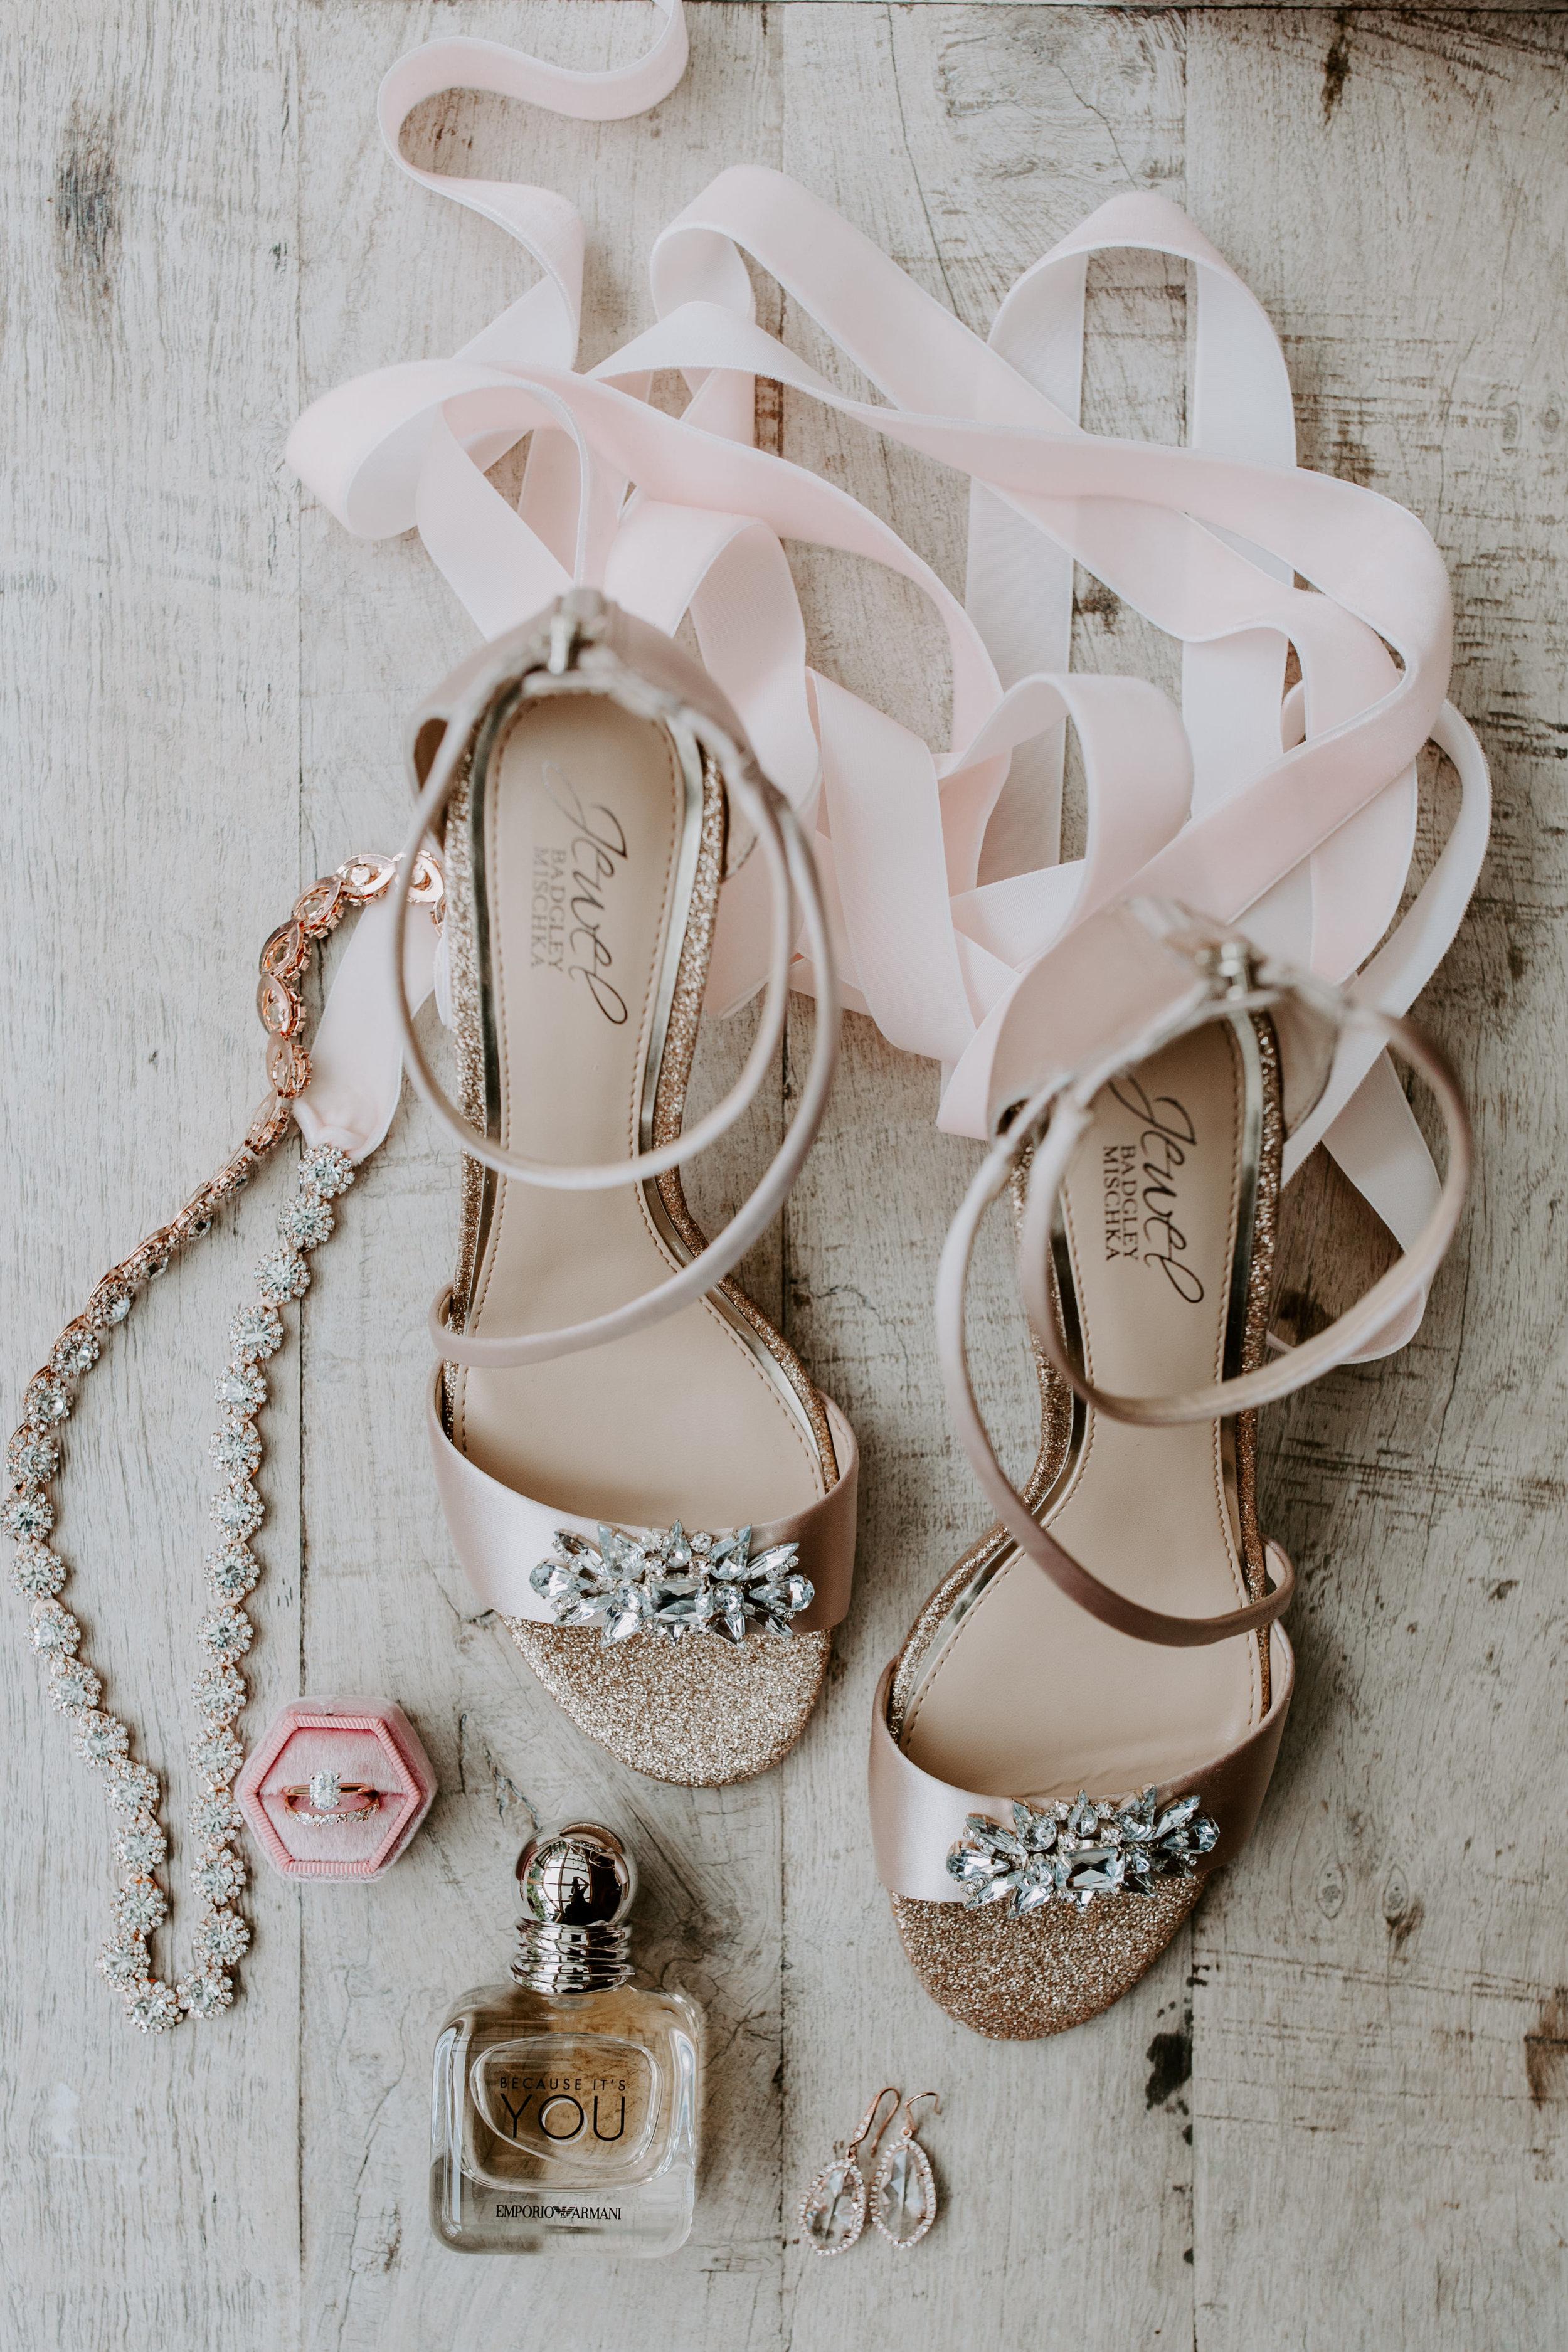 Rustic Bloom Photography   Rustic Woodland Wedding Inspiration   Wedding Shoes